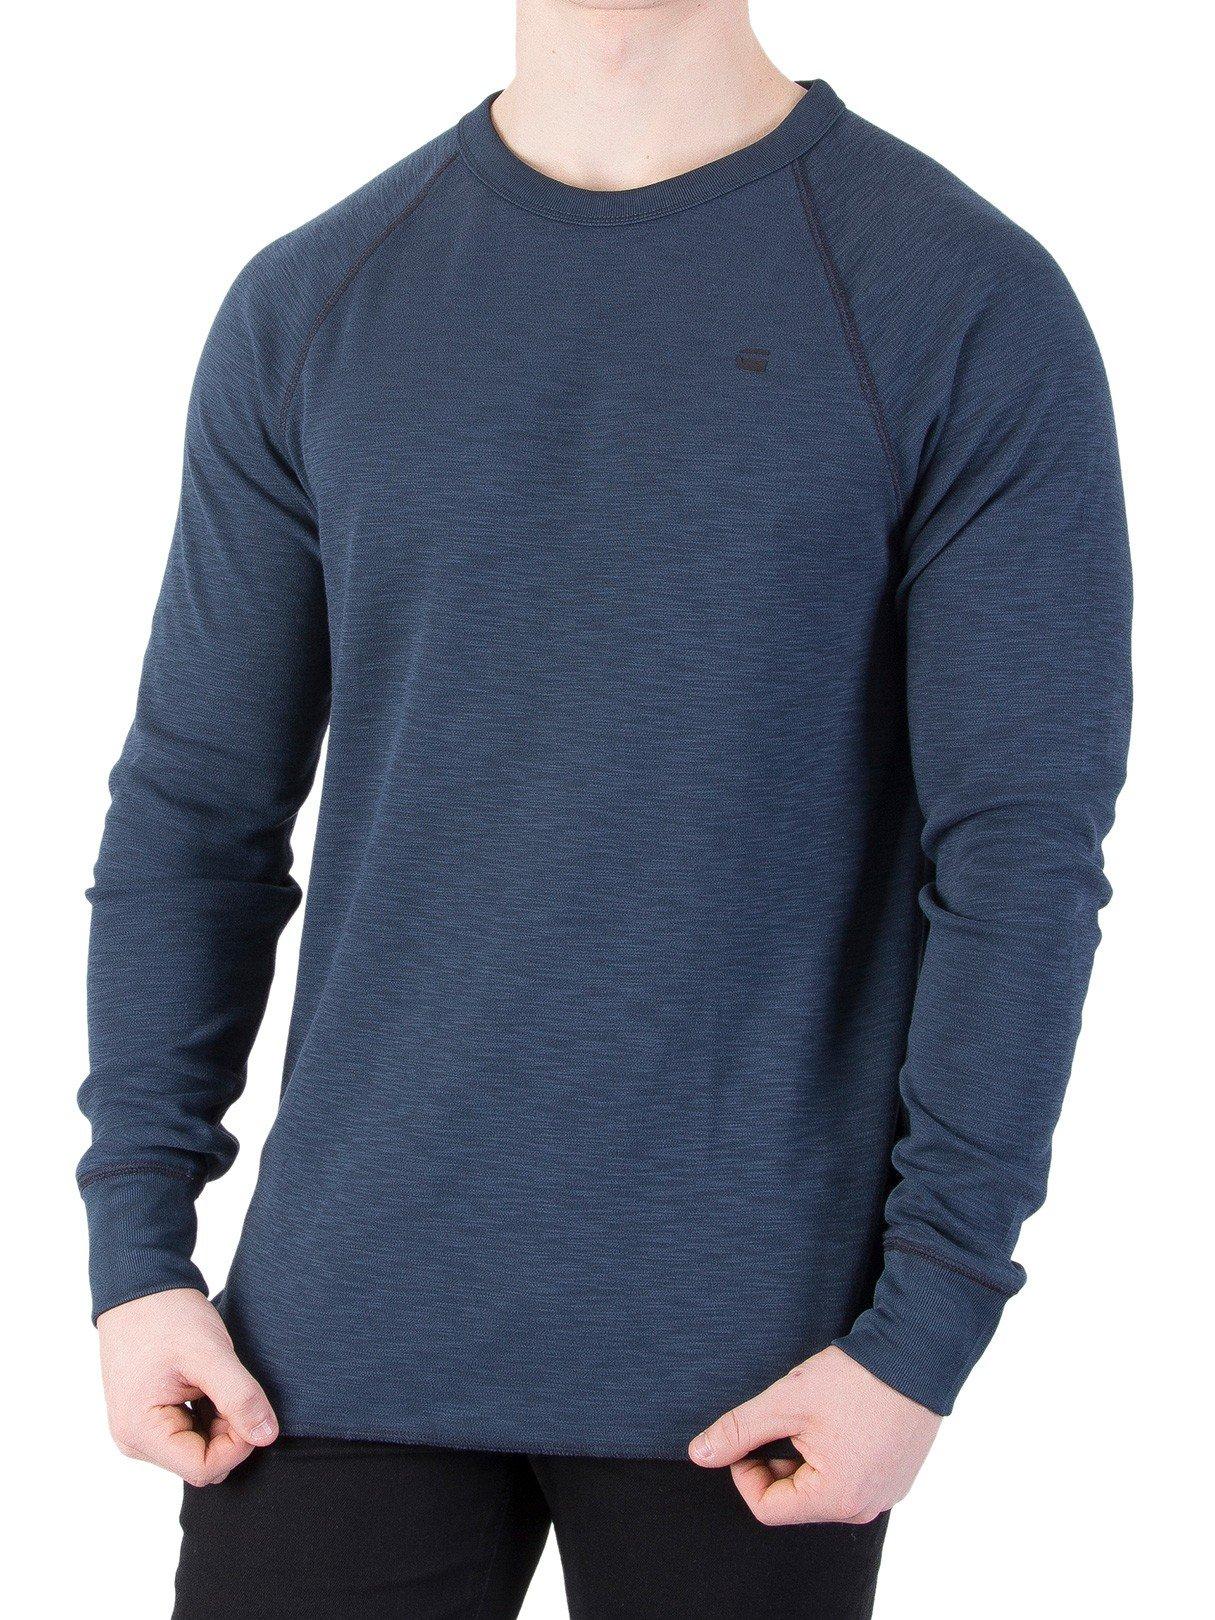 G-Star Men's RC Jirgi Longsleeved T-Shirt, Blue, Large